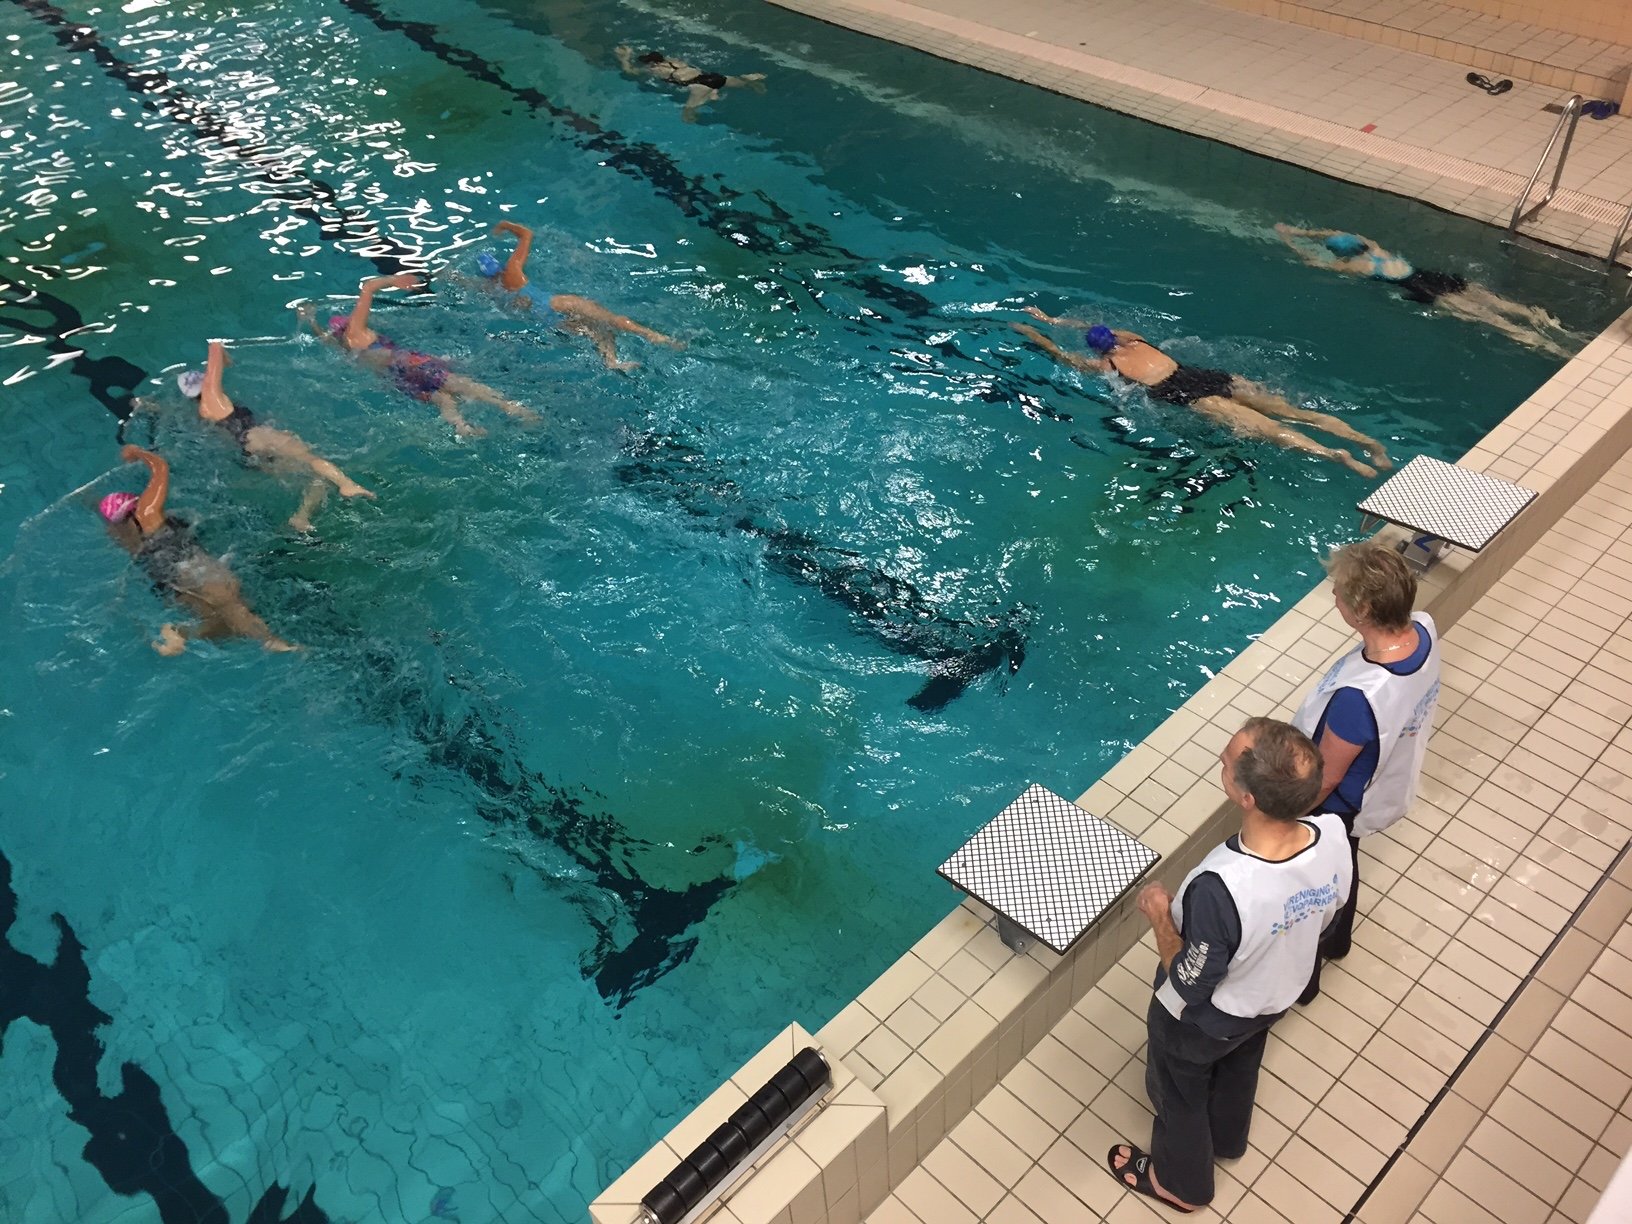 Vroegzwemmen nu ook in de winter! vereniging flevoparkbad